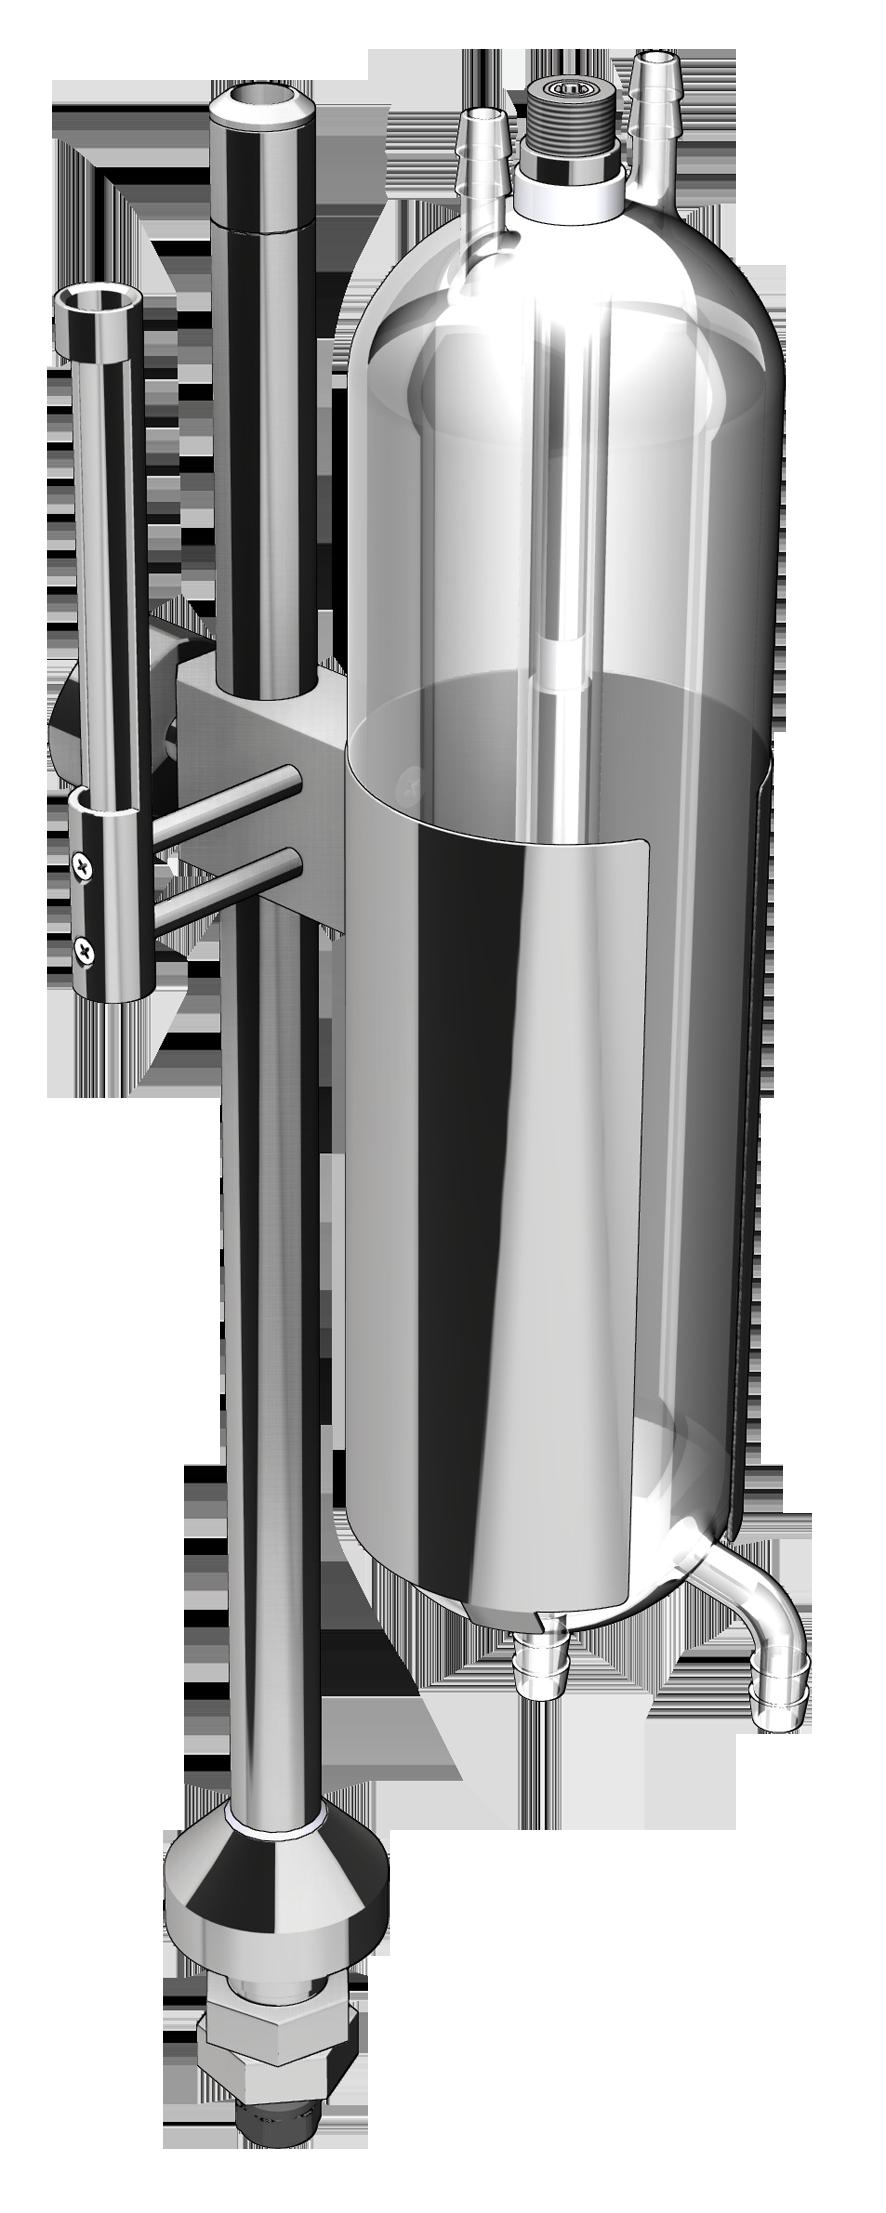 Stativ-zu-GF-1000-Imp